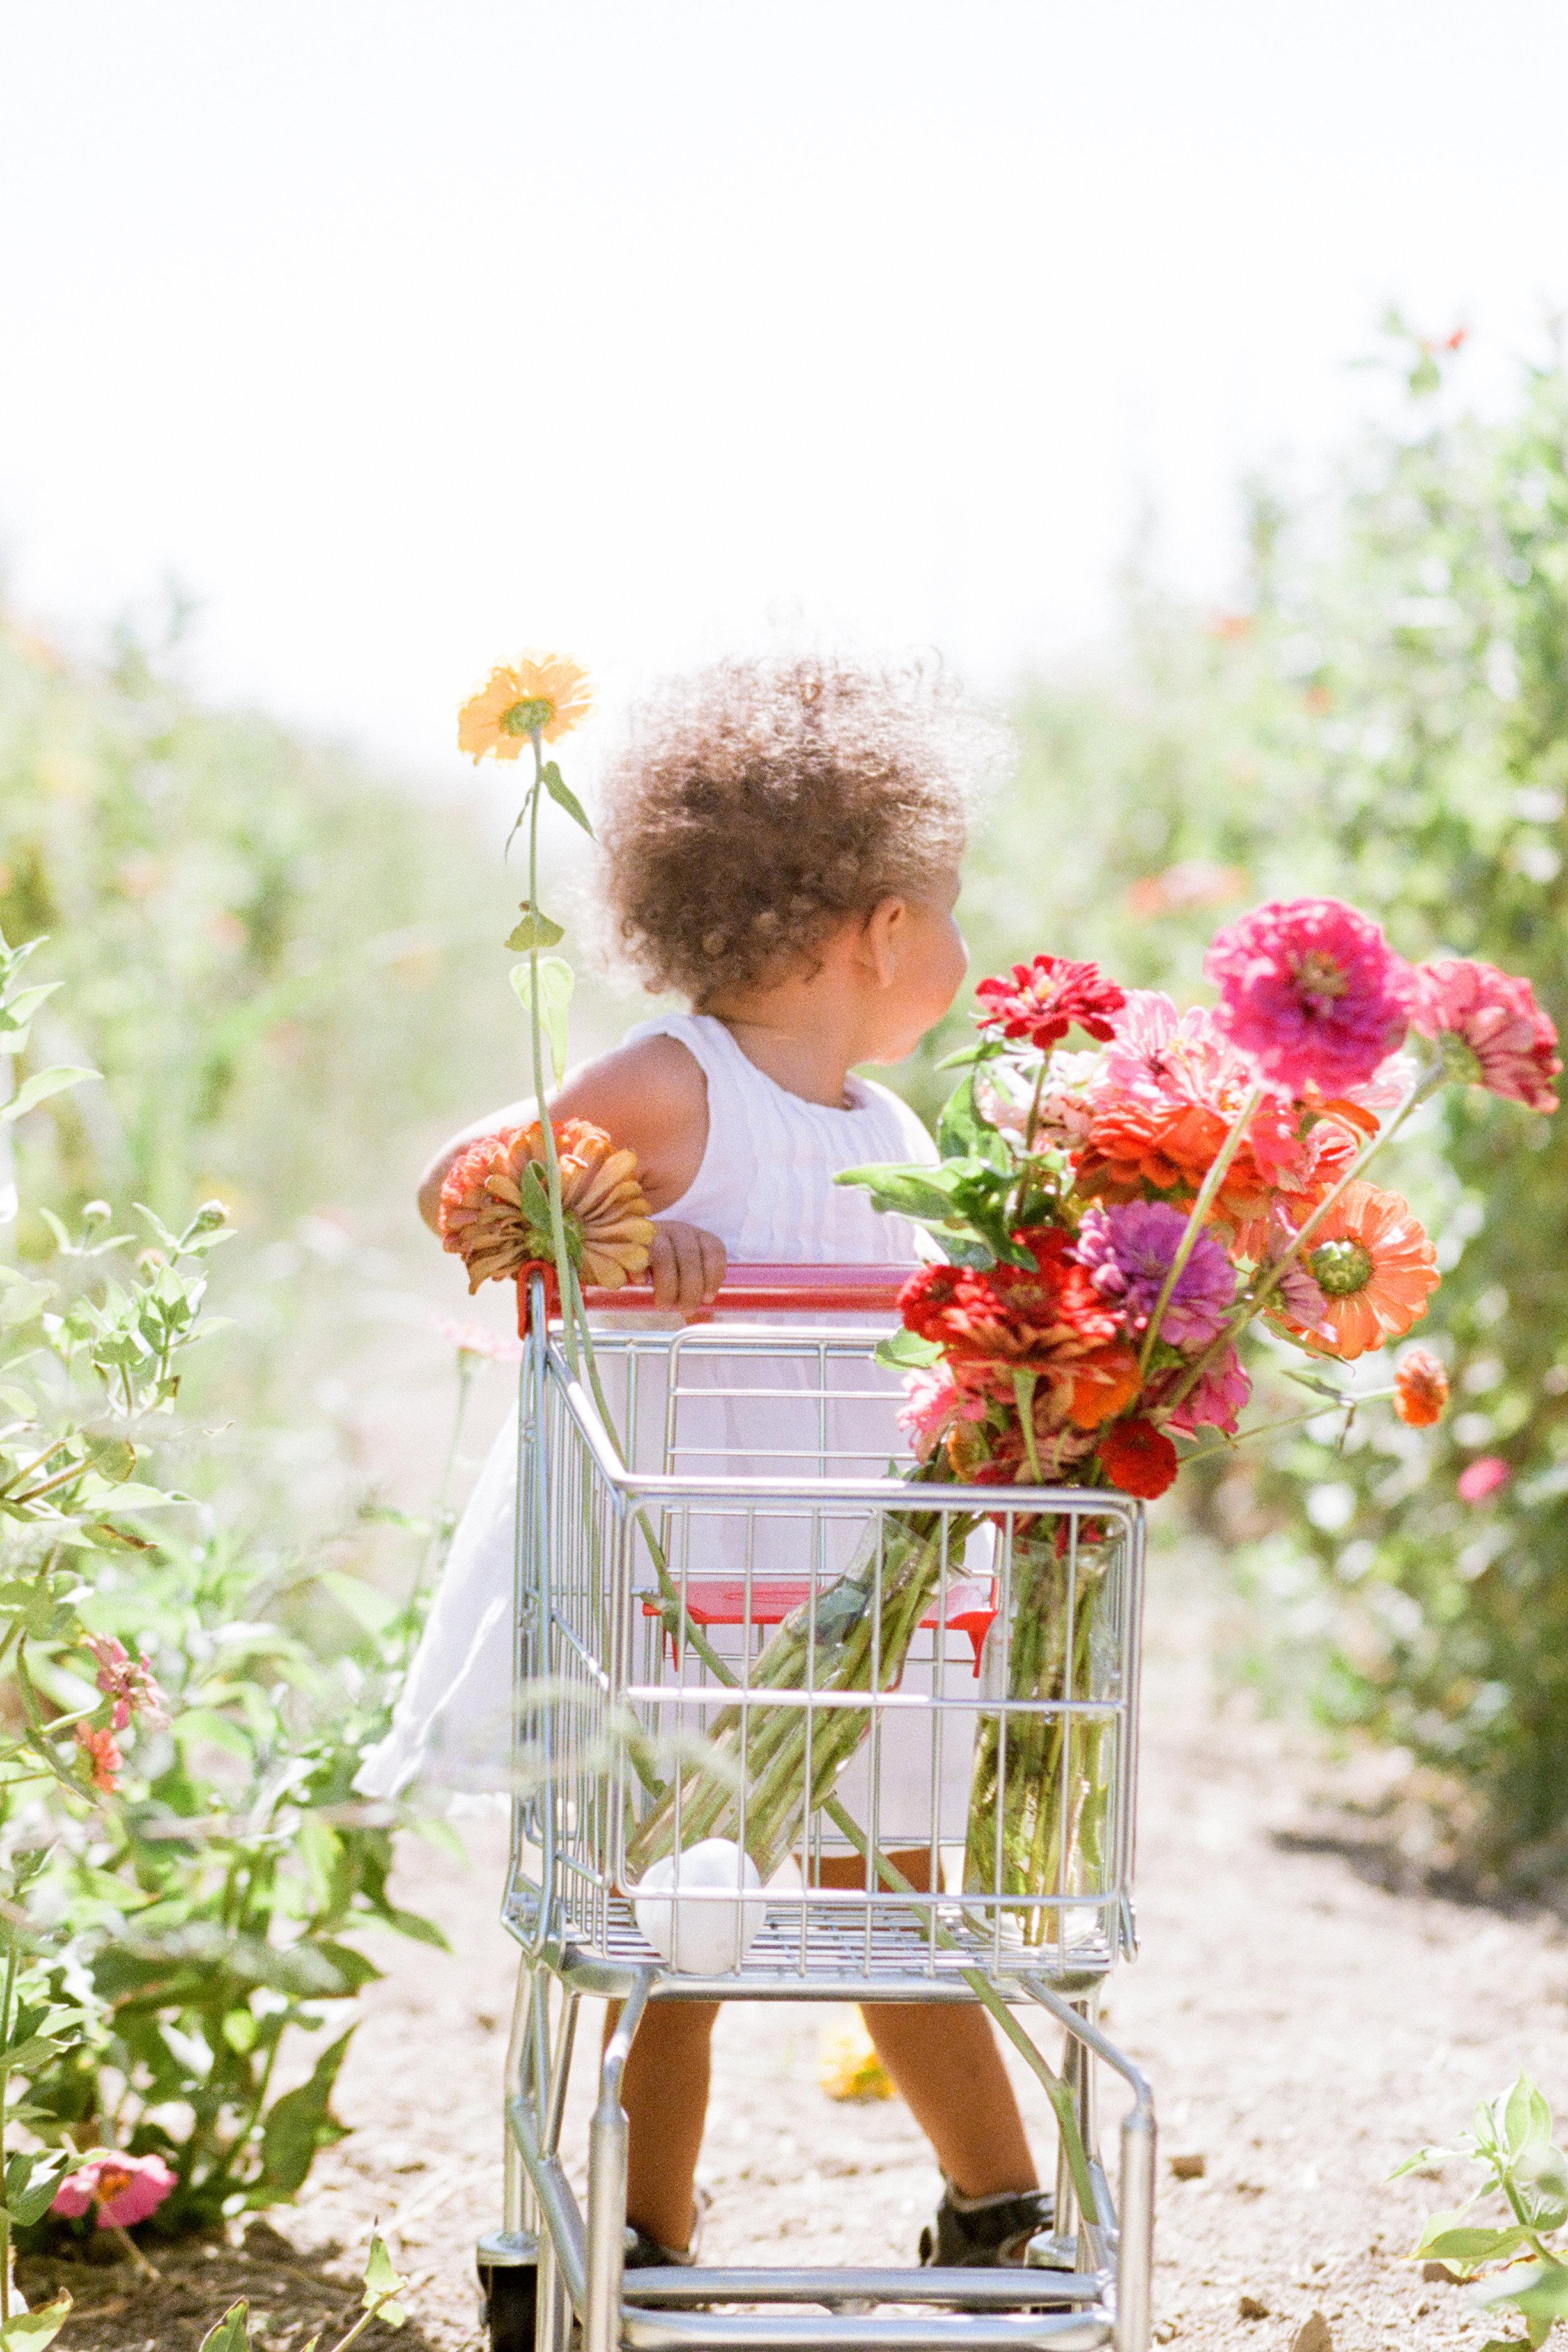 zinnia-baby-california-flowers-baby-photograph by Rachel Sima Photography